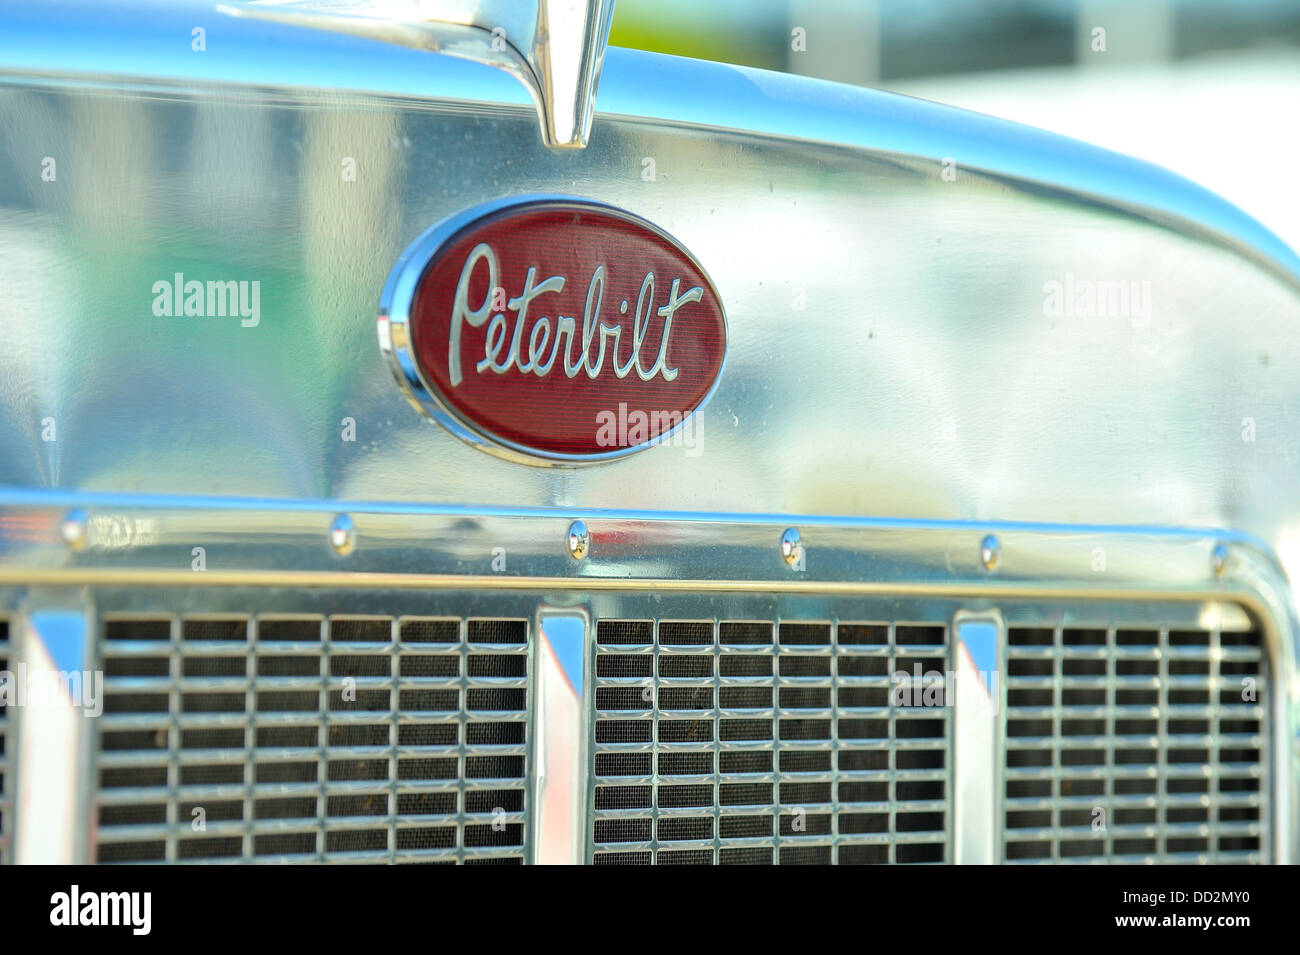 Mercedes Of Warwick >> Truck Badge Stock Photos & Truck Badge Stock Images - Alamy